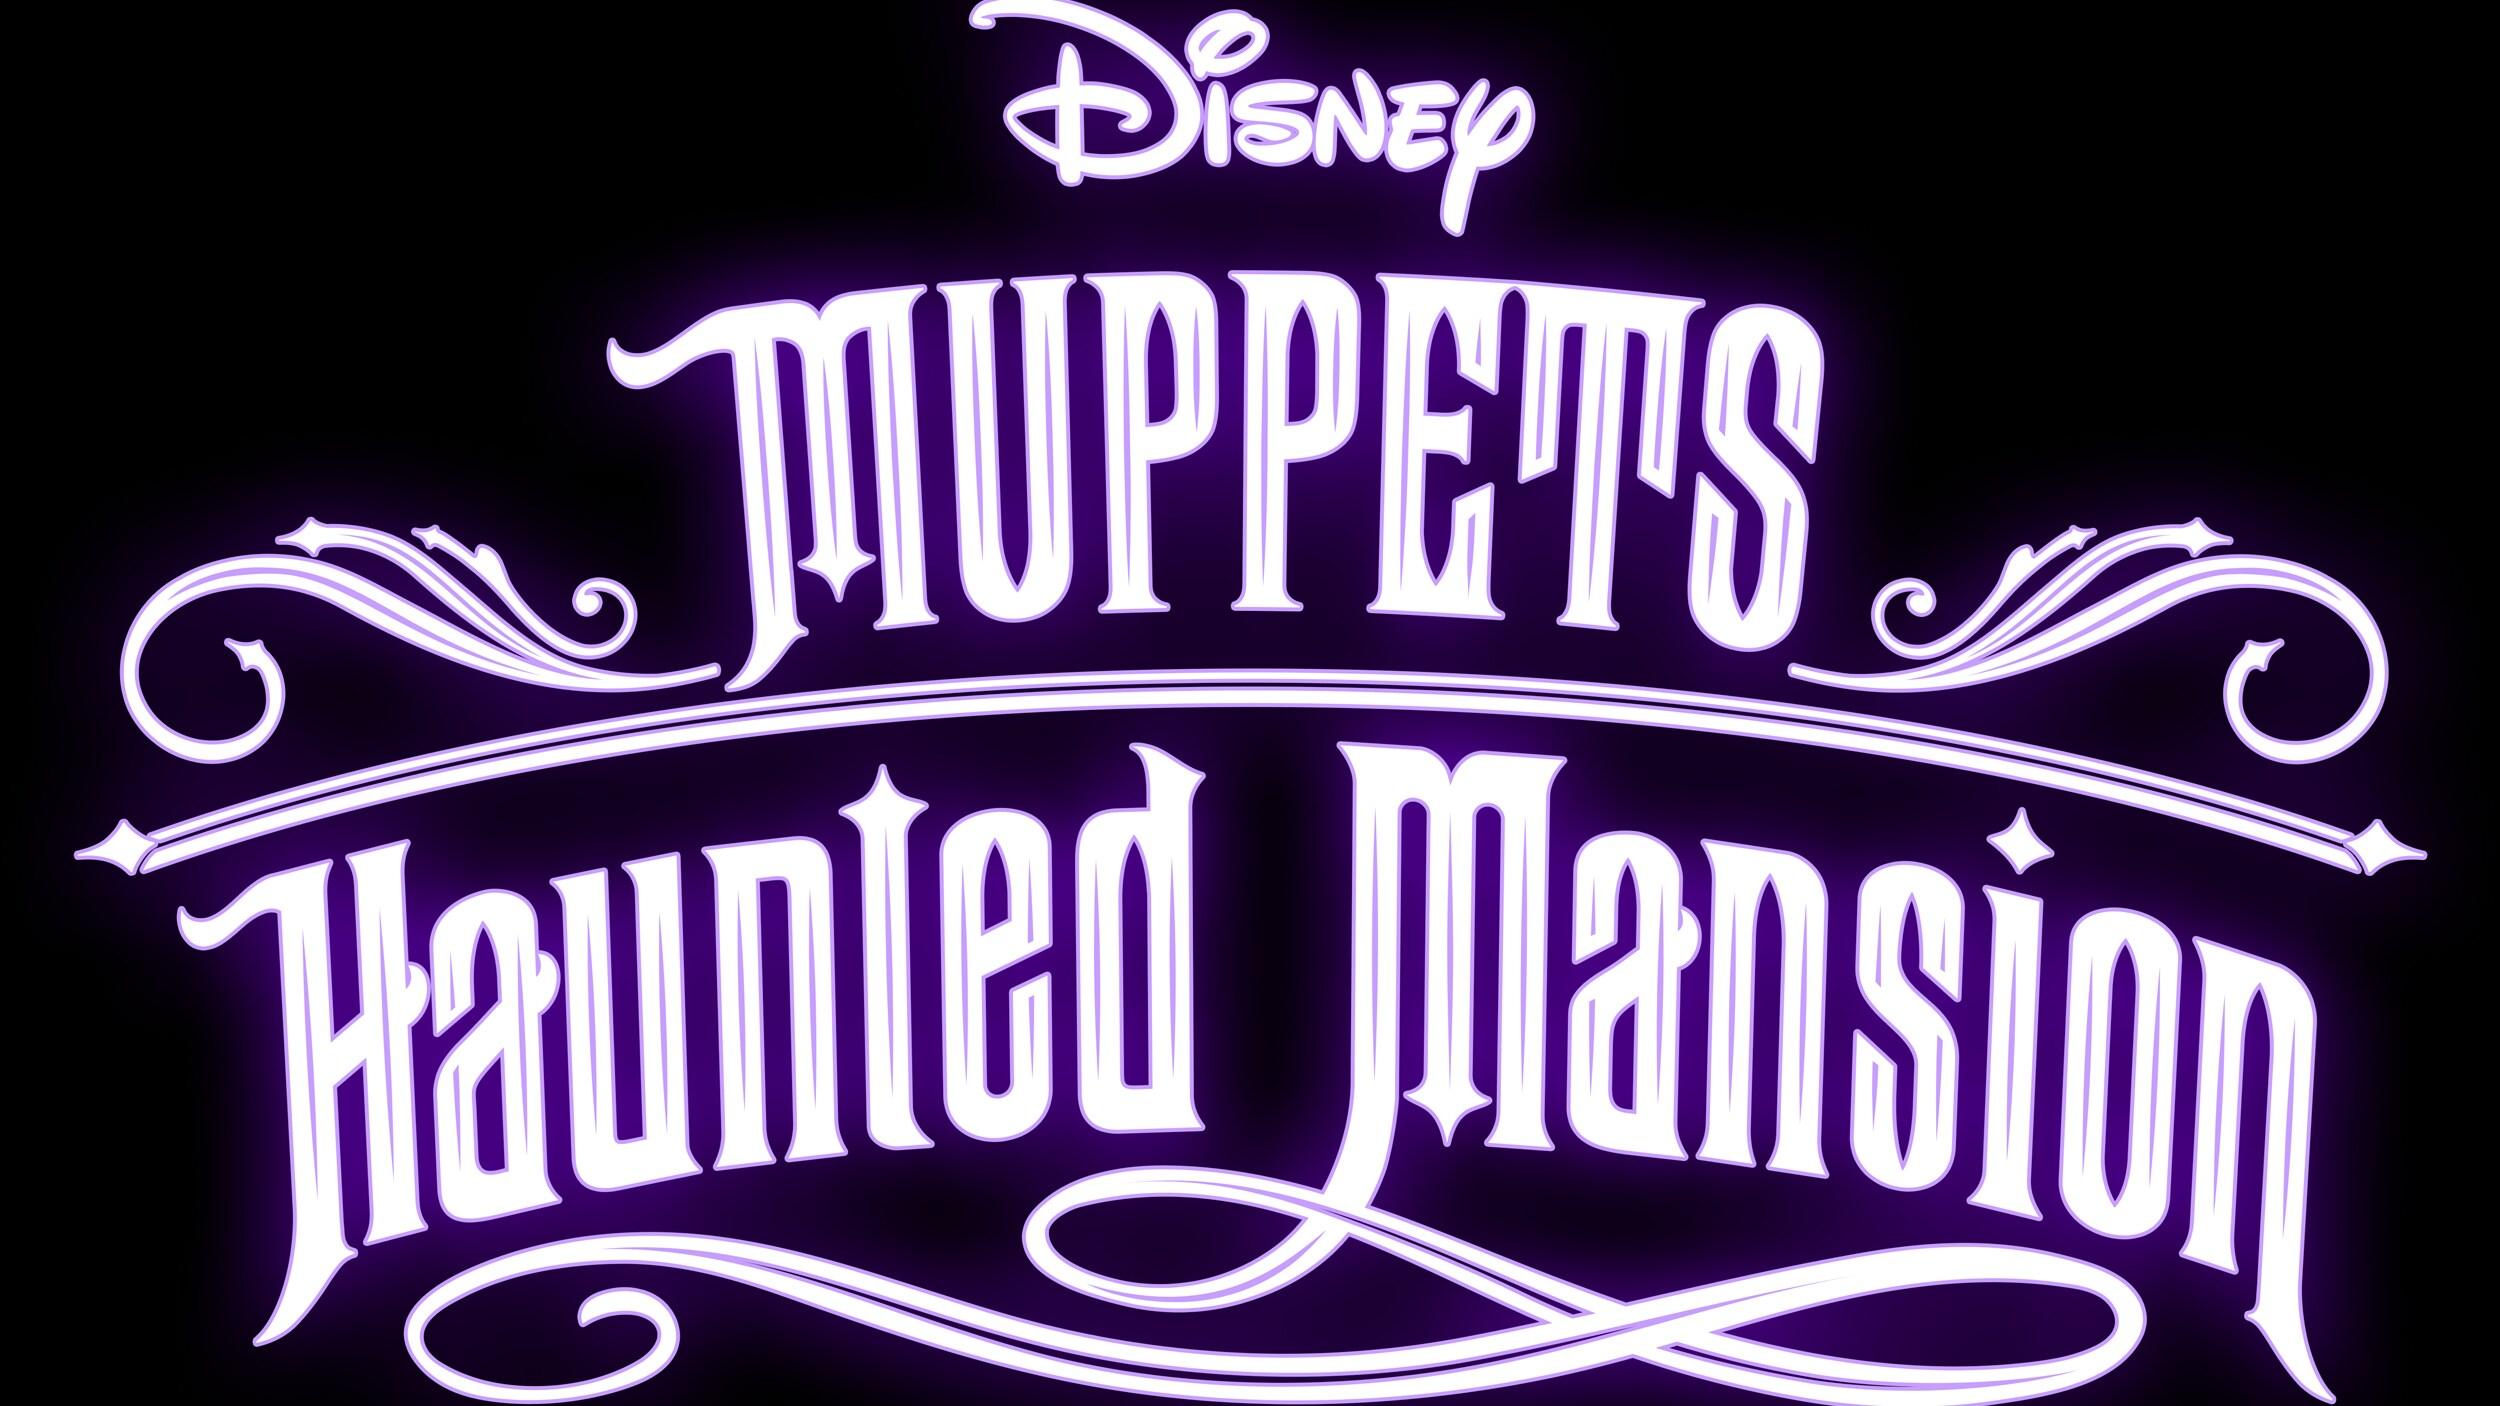 Muppets Haunted Mansion Logo - Black